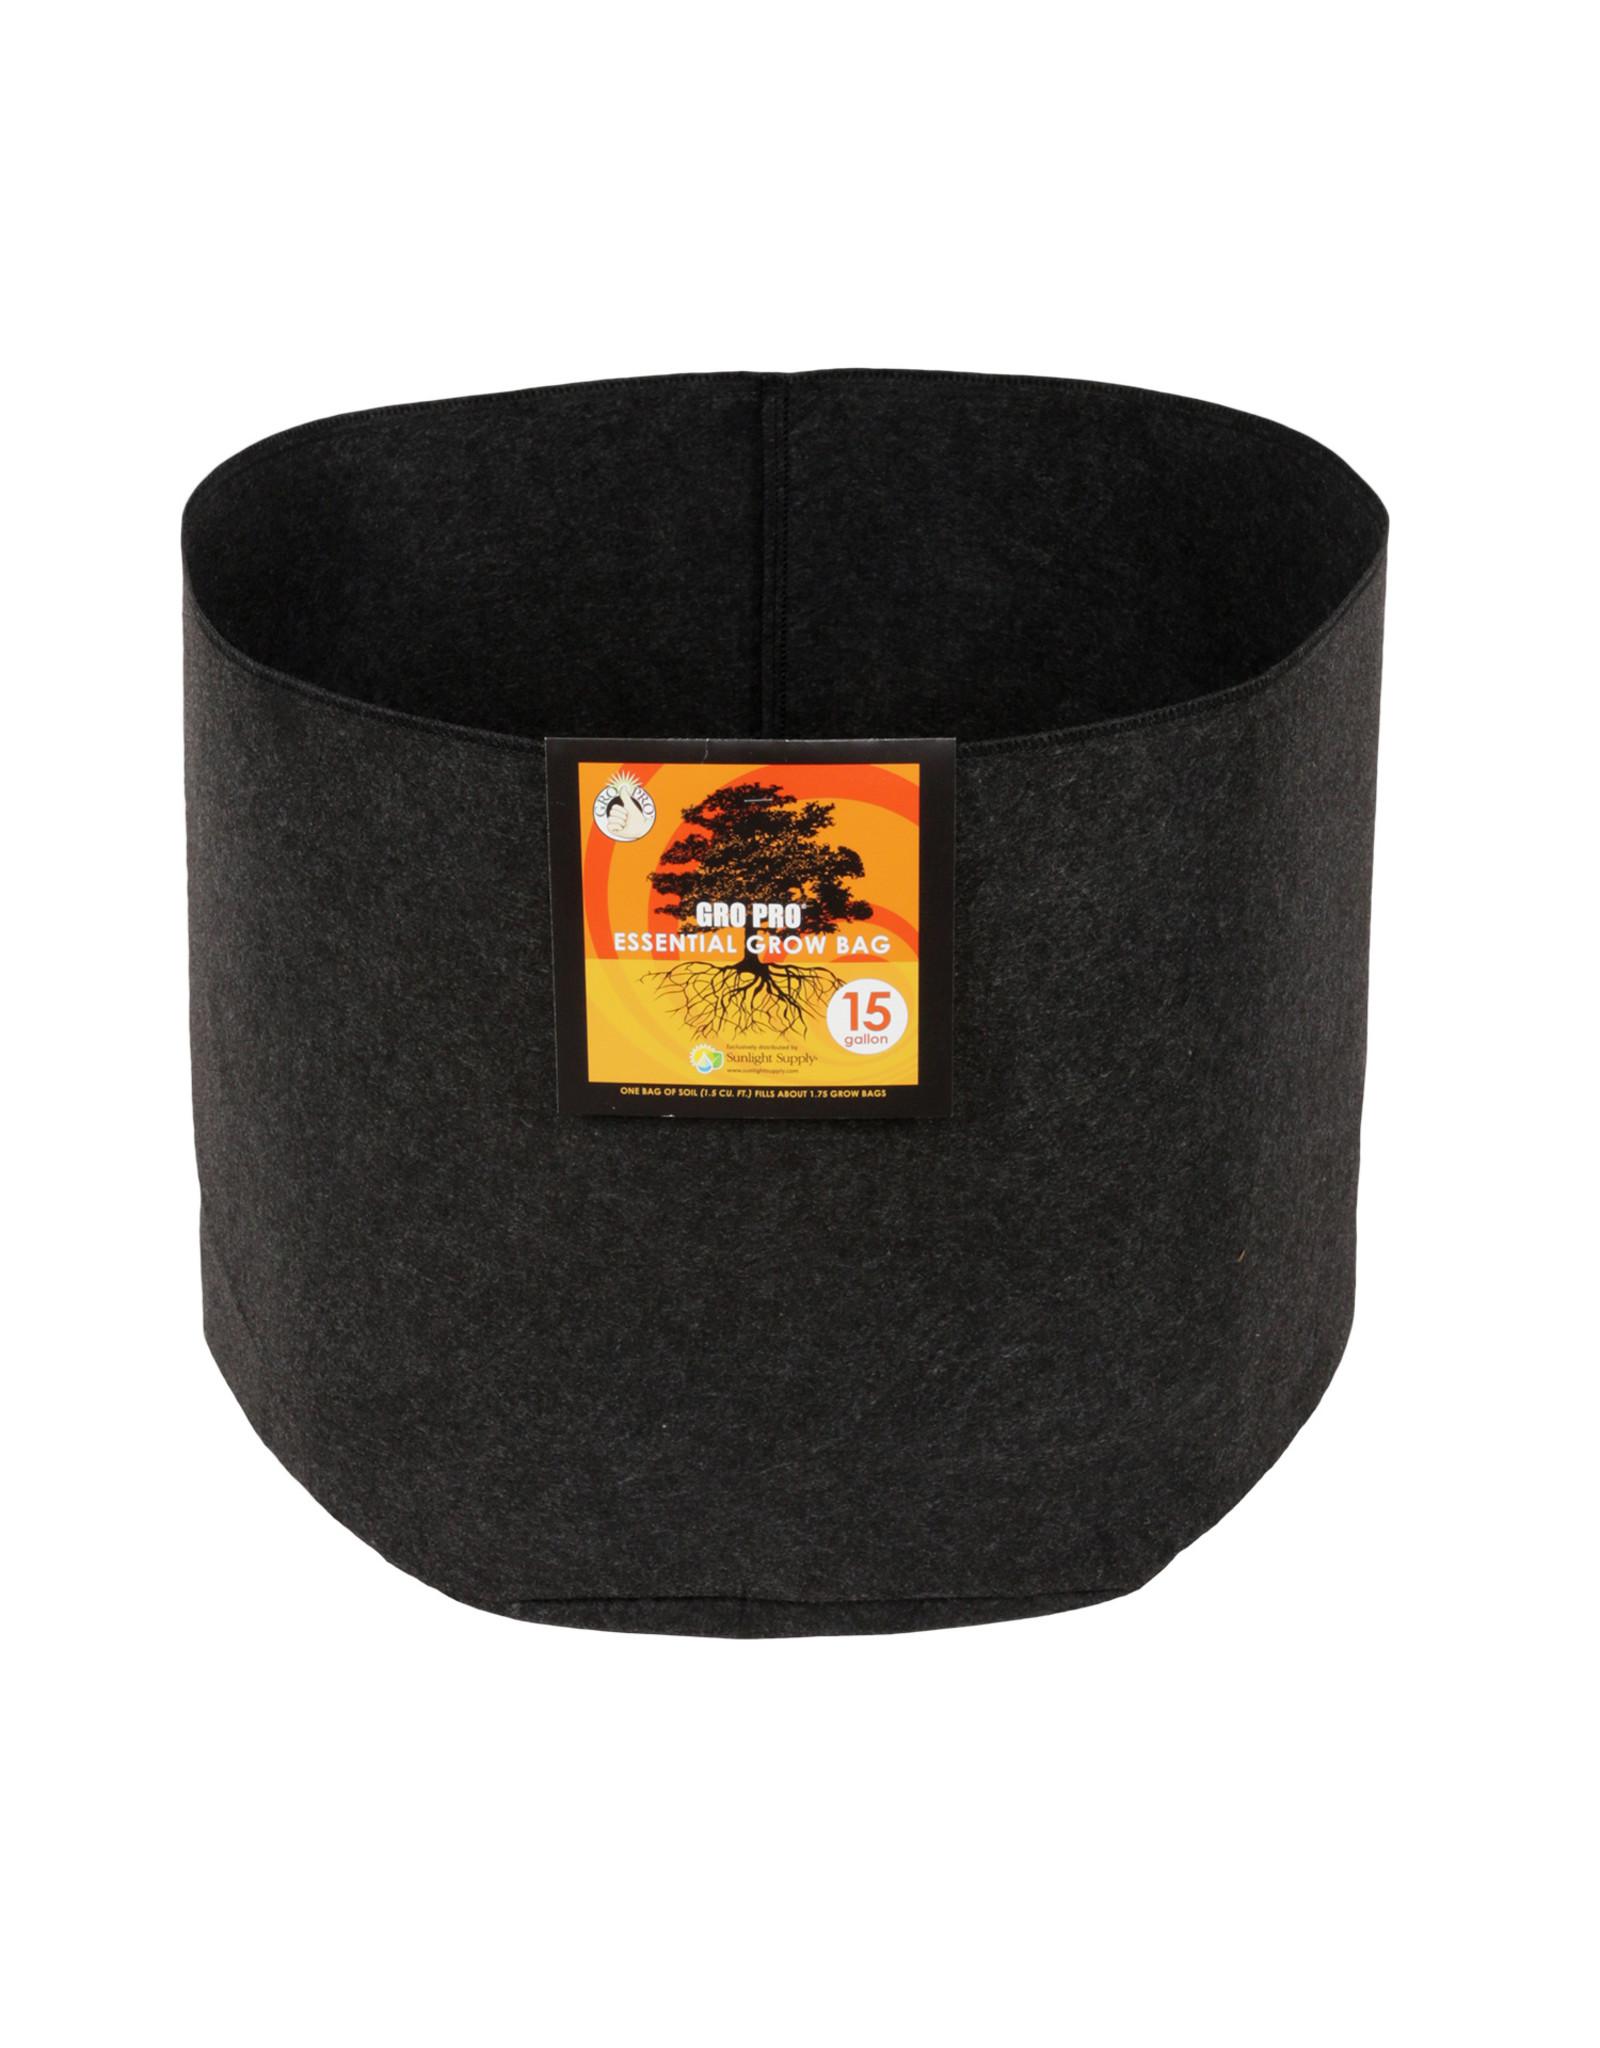 Gro Pro Gro Pro Essential Round Fabric Pot - Black 15 Gallon